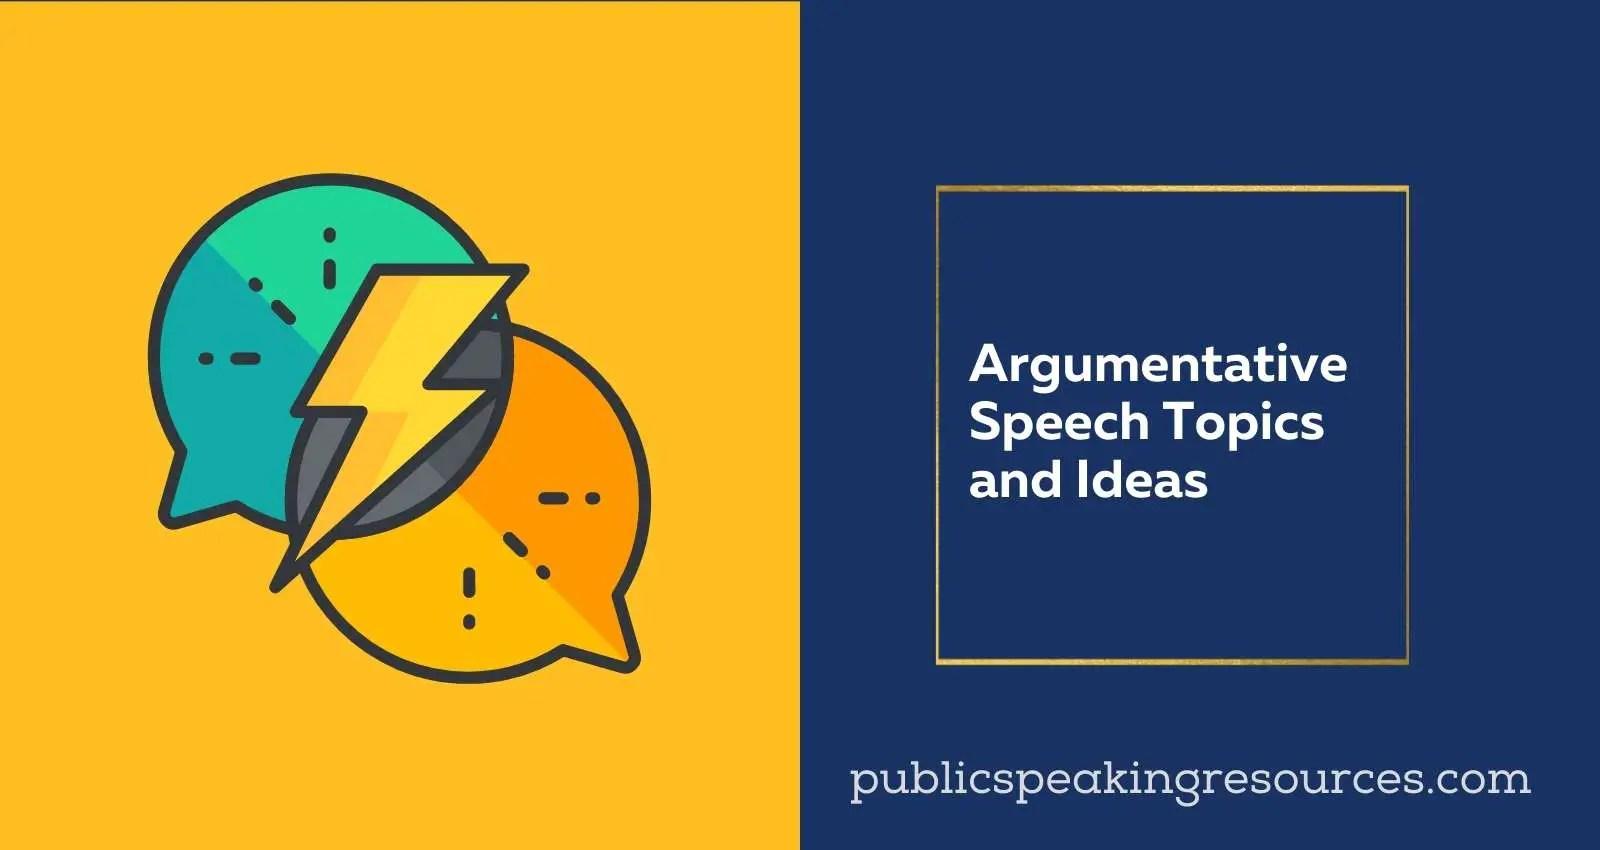 27 Argumentative Speech Topics & ideas: A Complete Guide